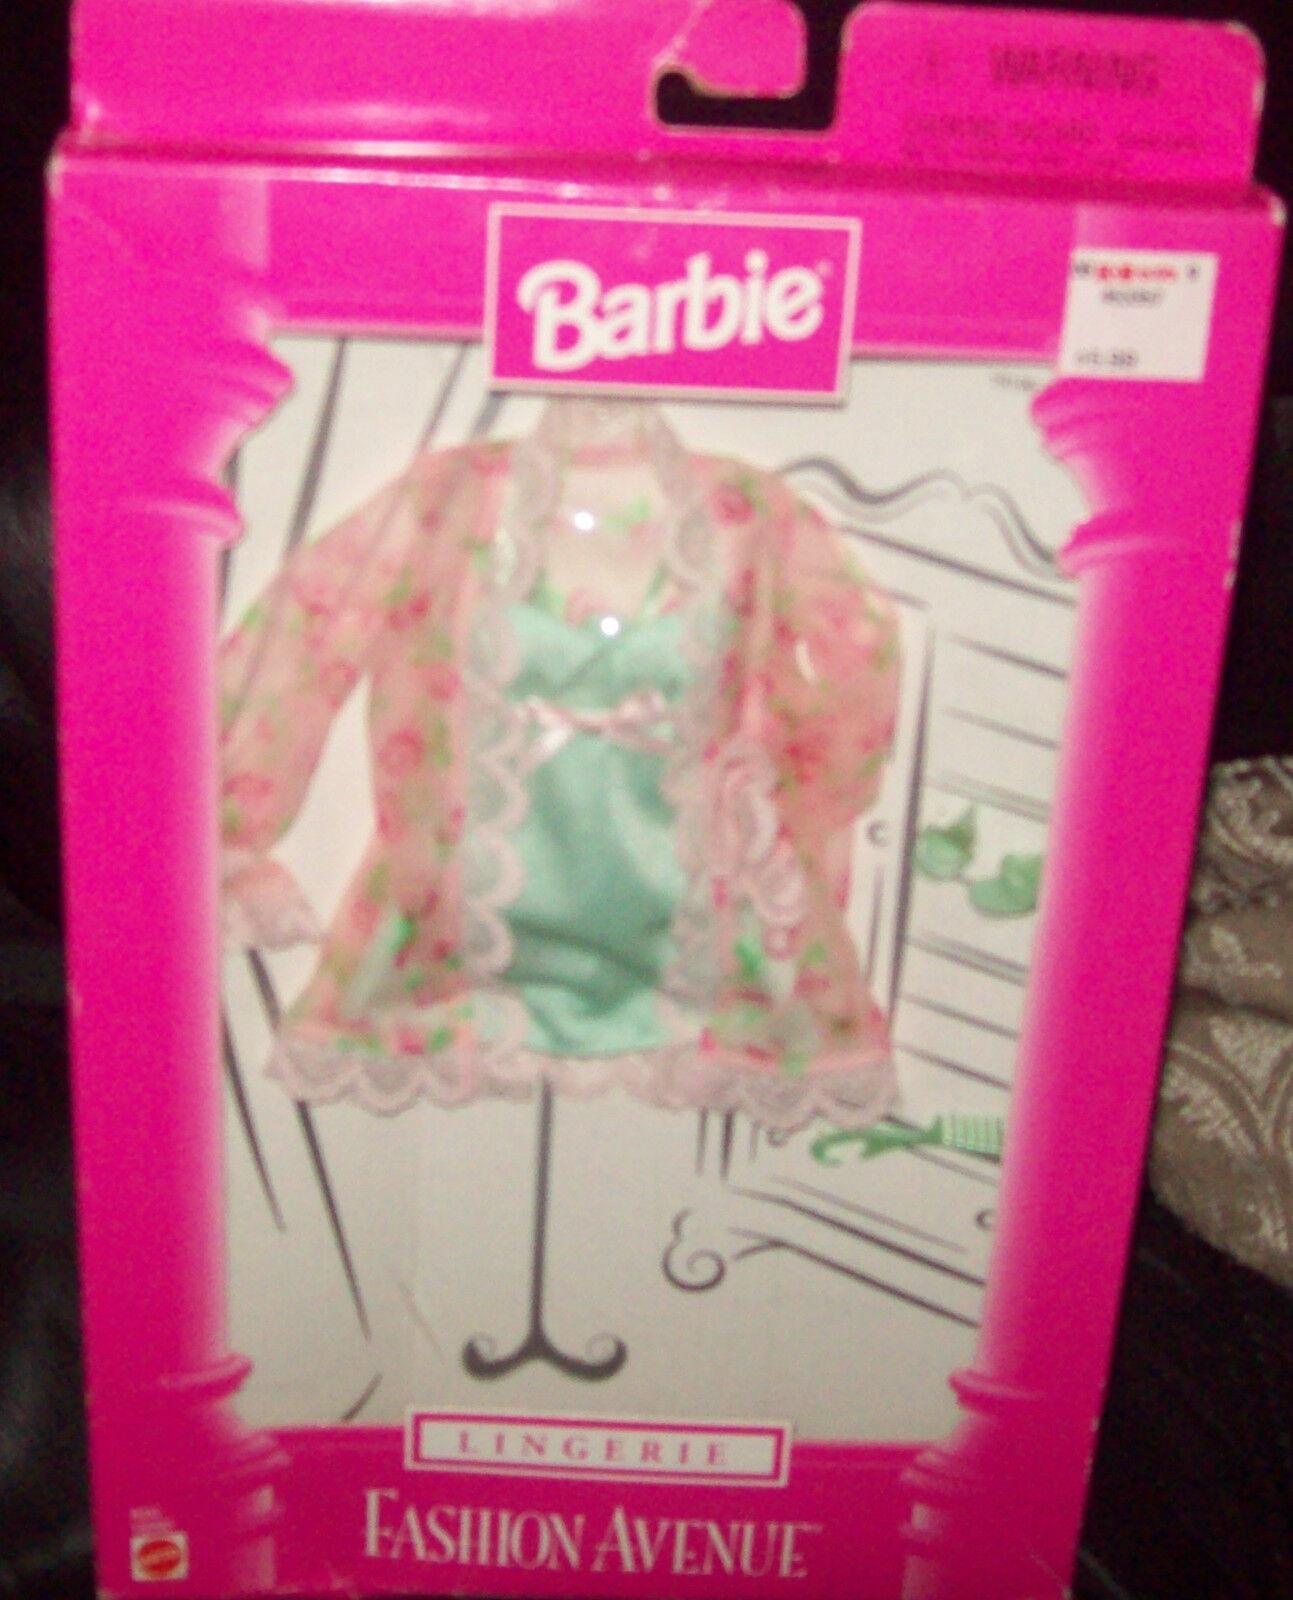 1998 Barbie Fashion Avenue Lingerie  Outfit by Mattel MIB